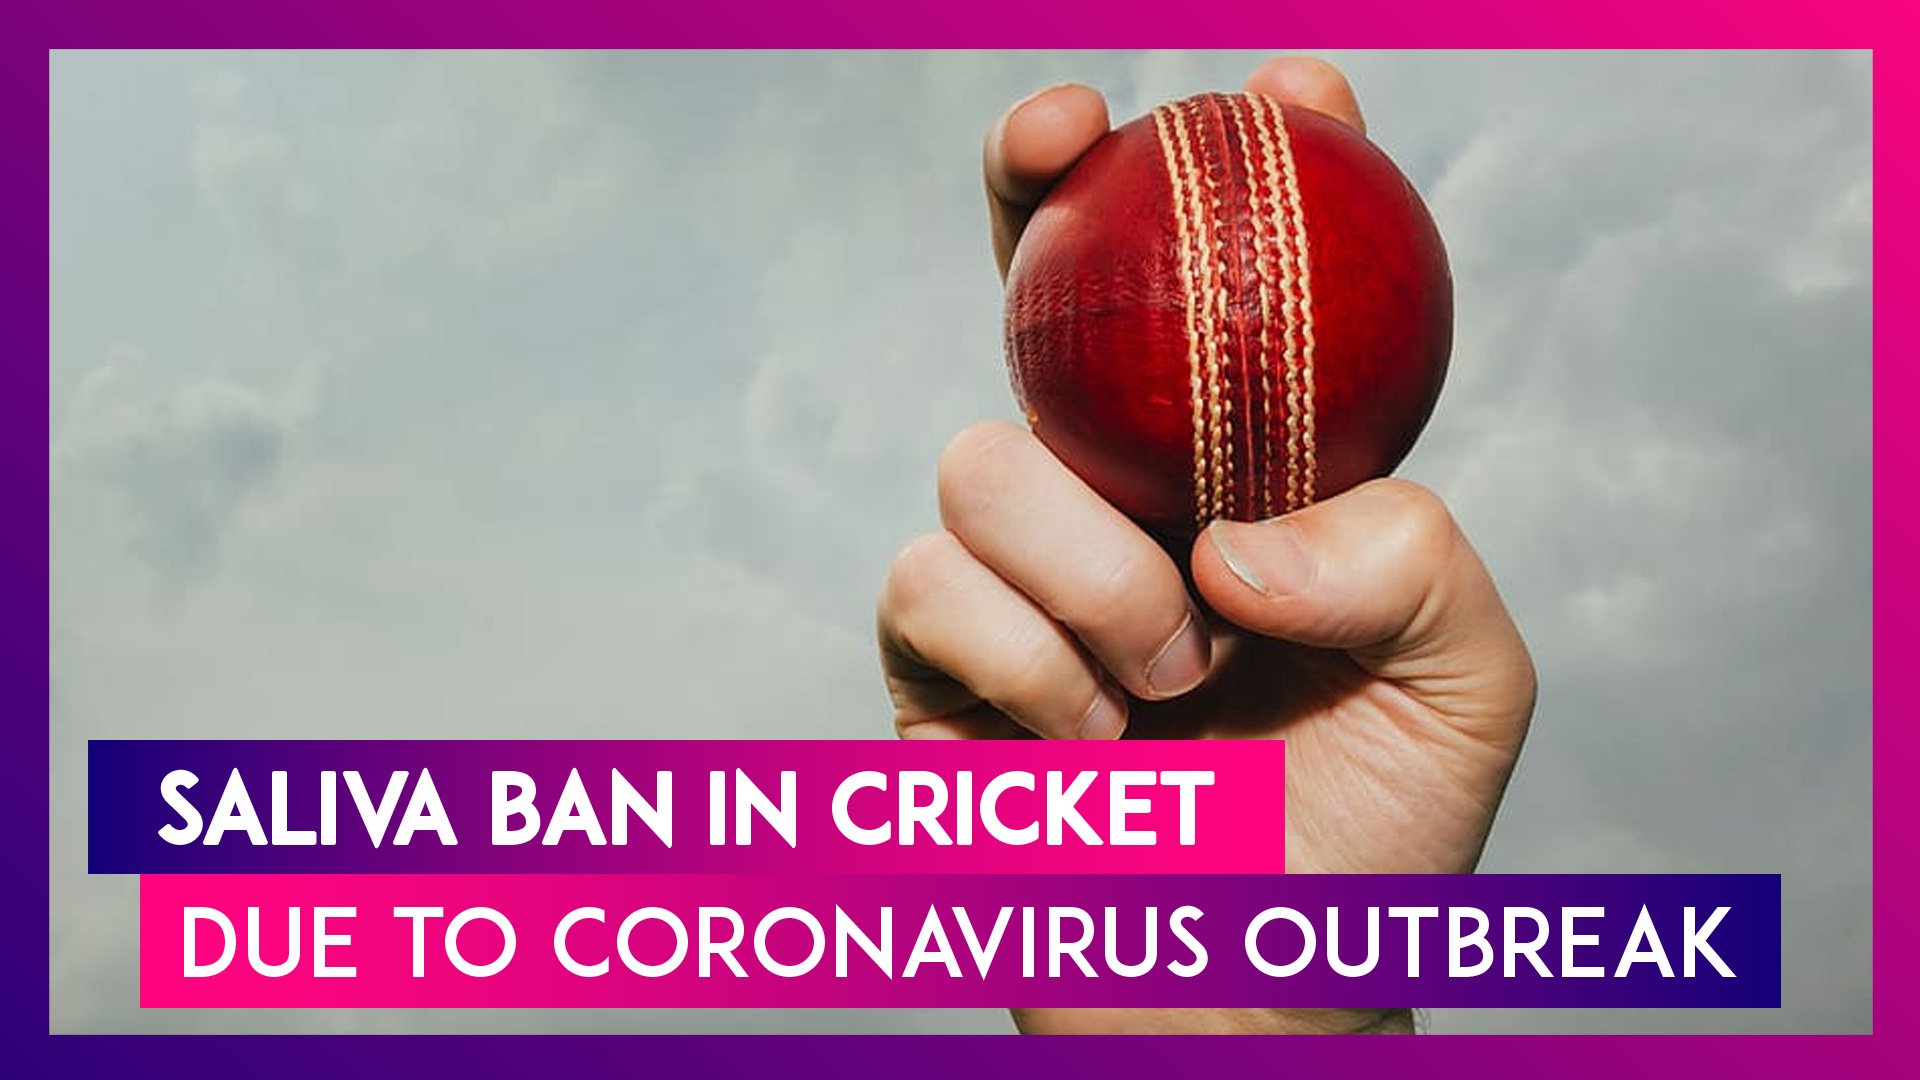 COVID-19 Impact On Cricket: Temporary Ban On Using Saliva To Swing Balls